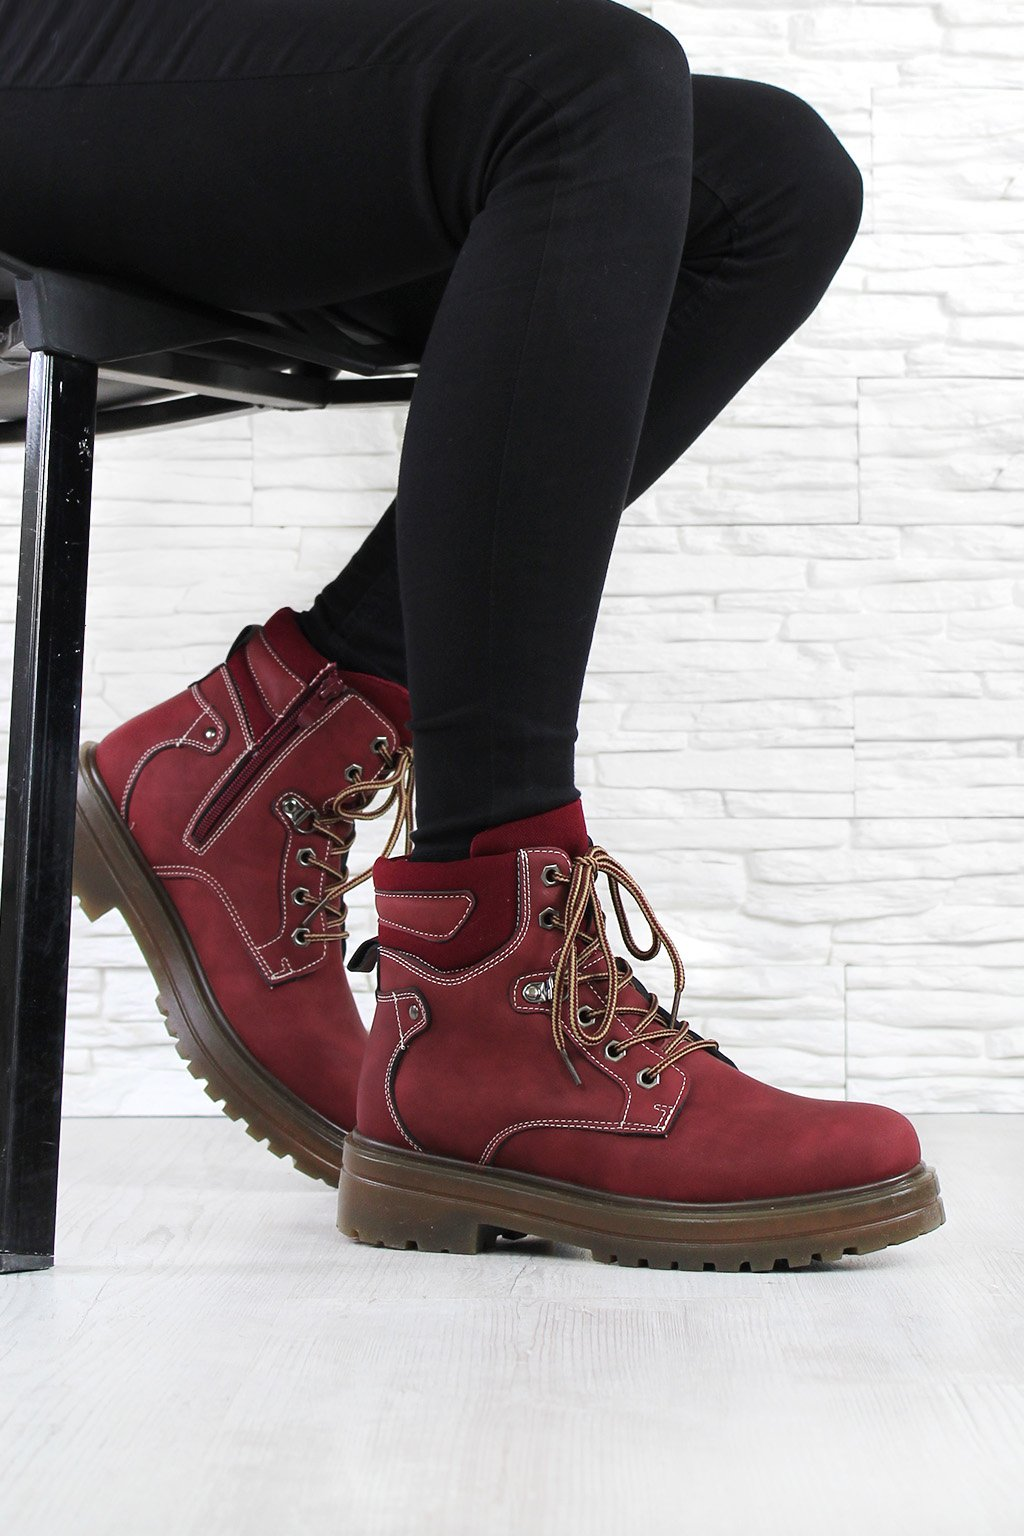 Červené boty farmářky D002R (3)